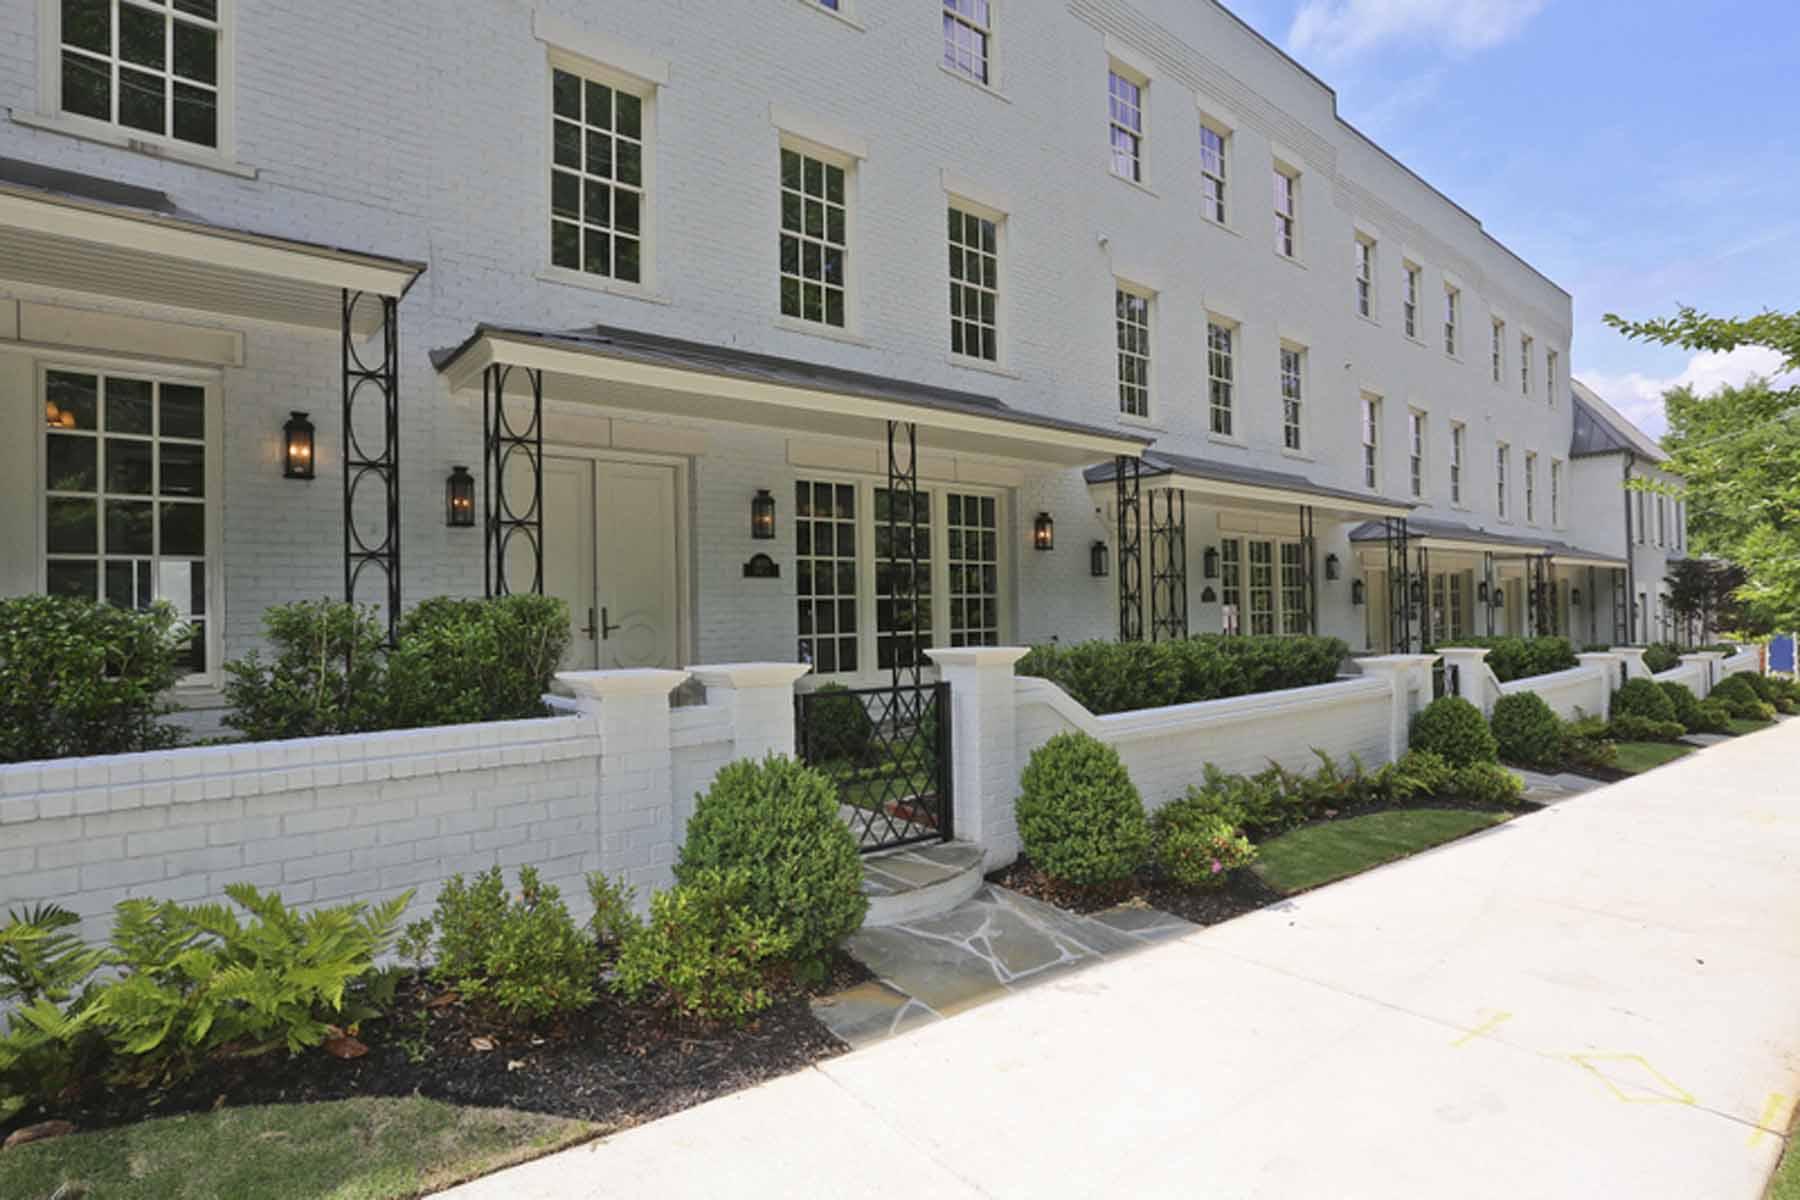 Таунхаус для того Продажа на BRAND NEW TOWNHOME BY MONTE HEWETT HOMES. 1400 Piedmont Avenue NE No. 5 Atlanta, Джорджия, 30309 Соединенные Штаты